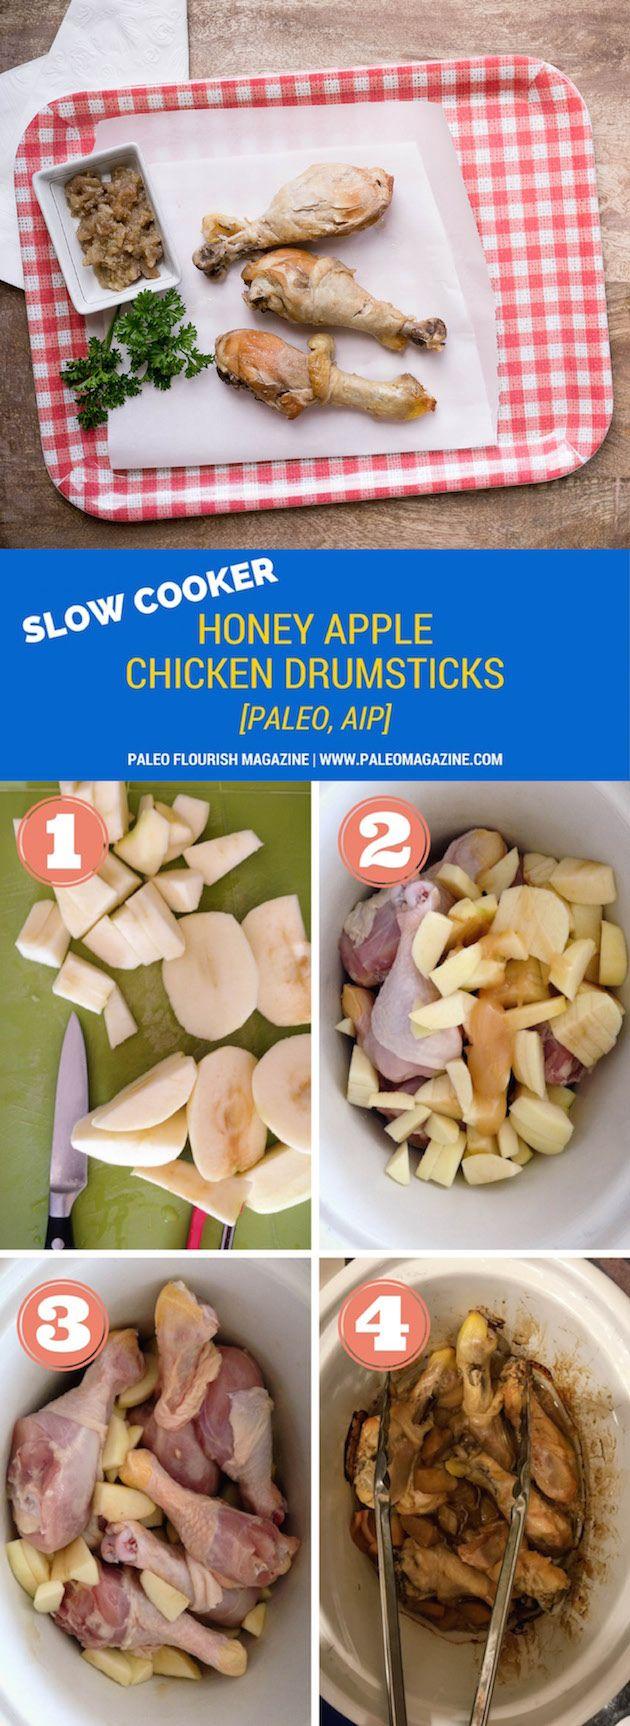 Paleo Slow Cooker Honey Apple Chicken Drumsticks Recipe - http://paleomagazine.compaleo-slow-cooker-apple-honey-chicken-drumsticks-recipe